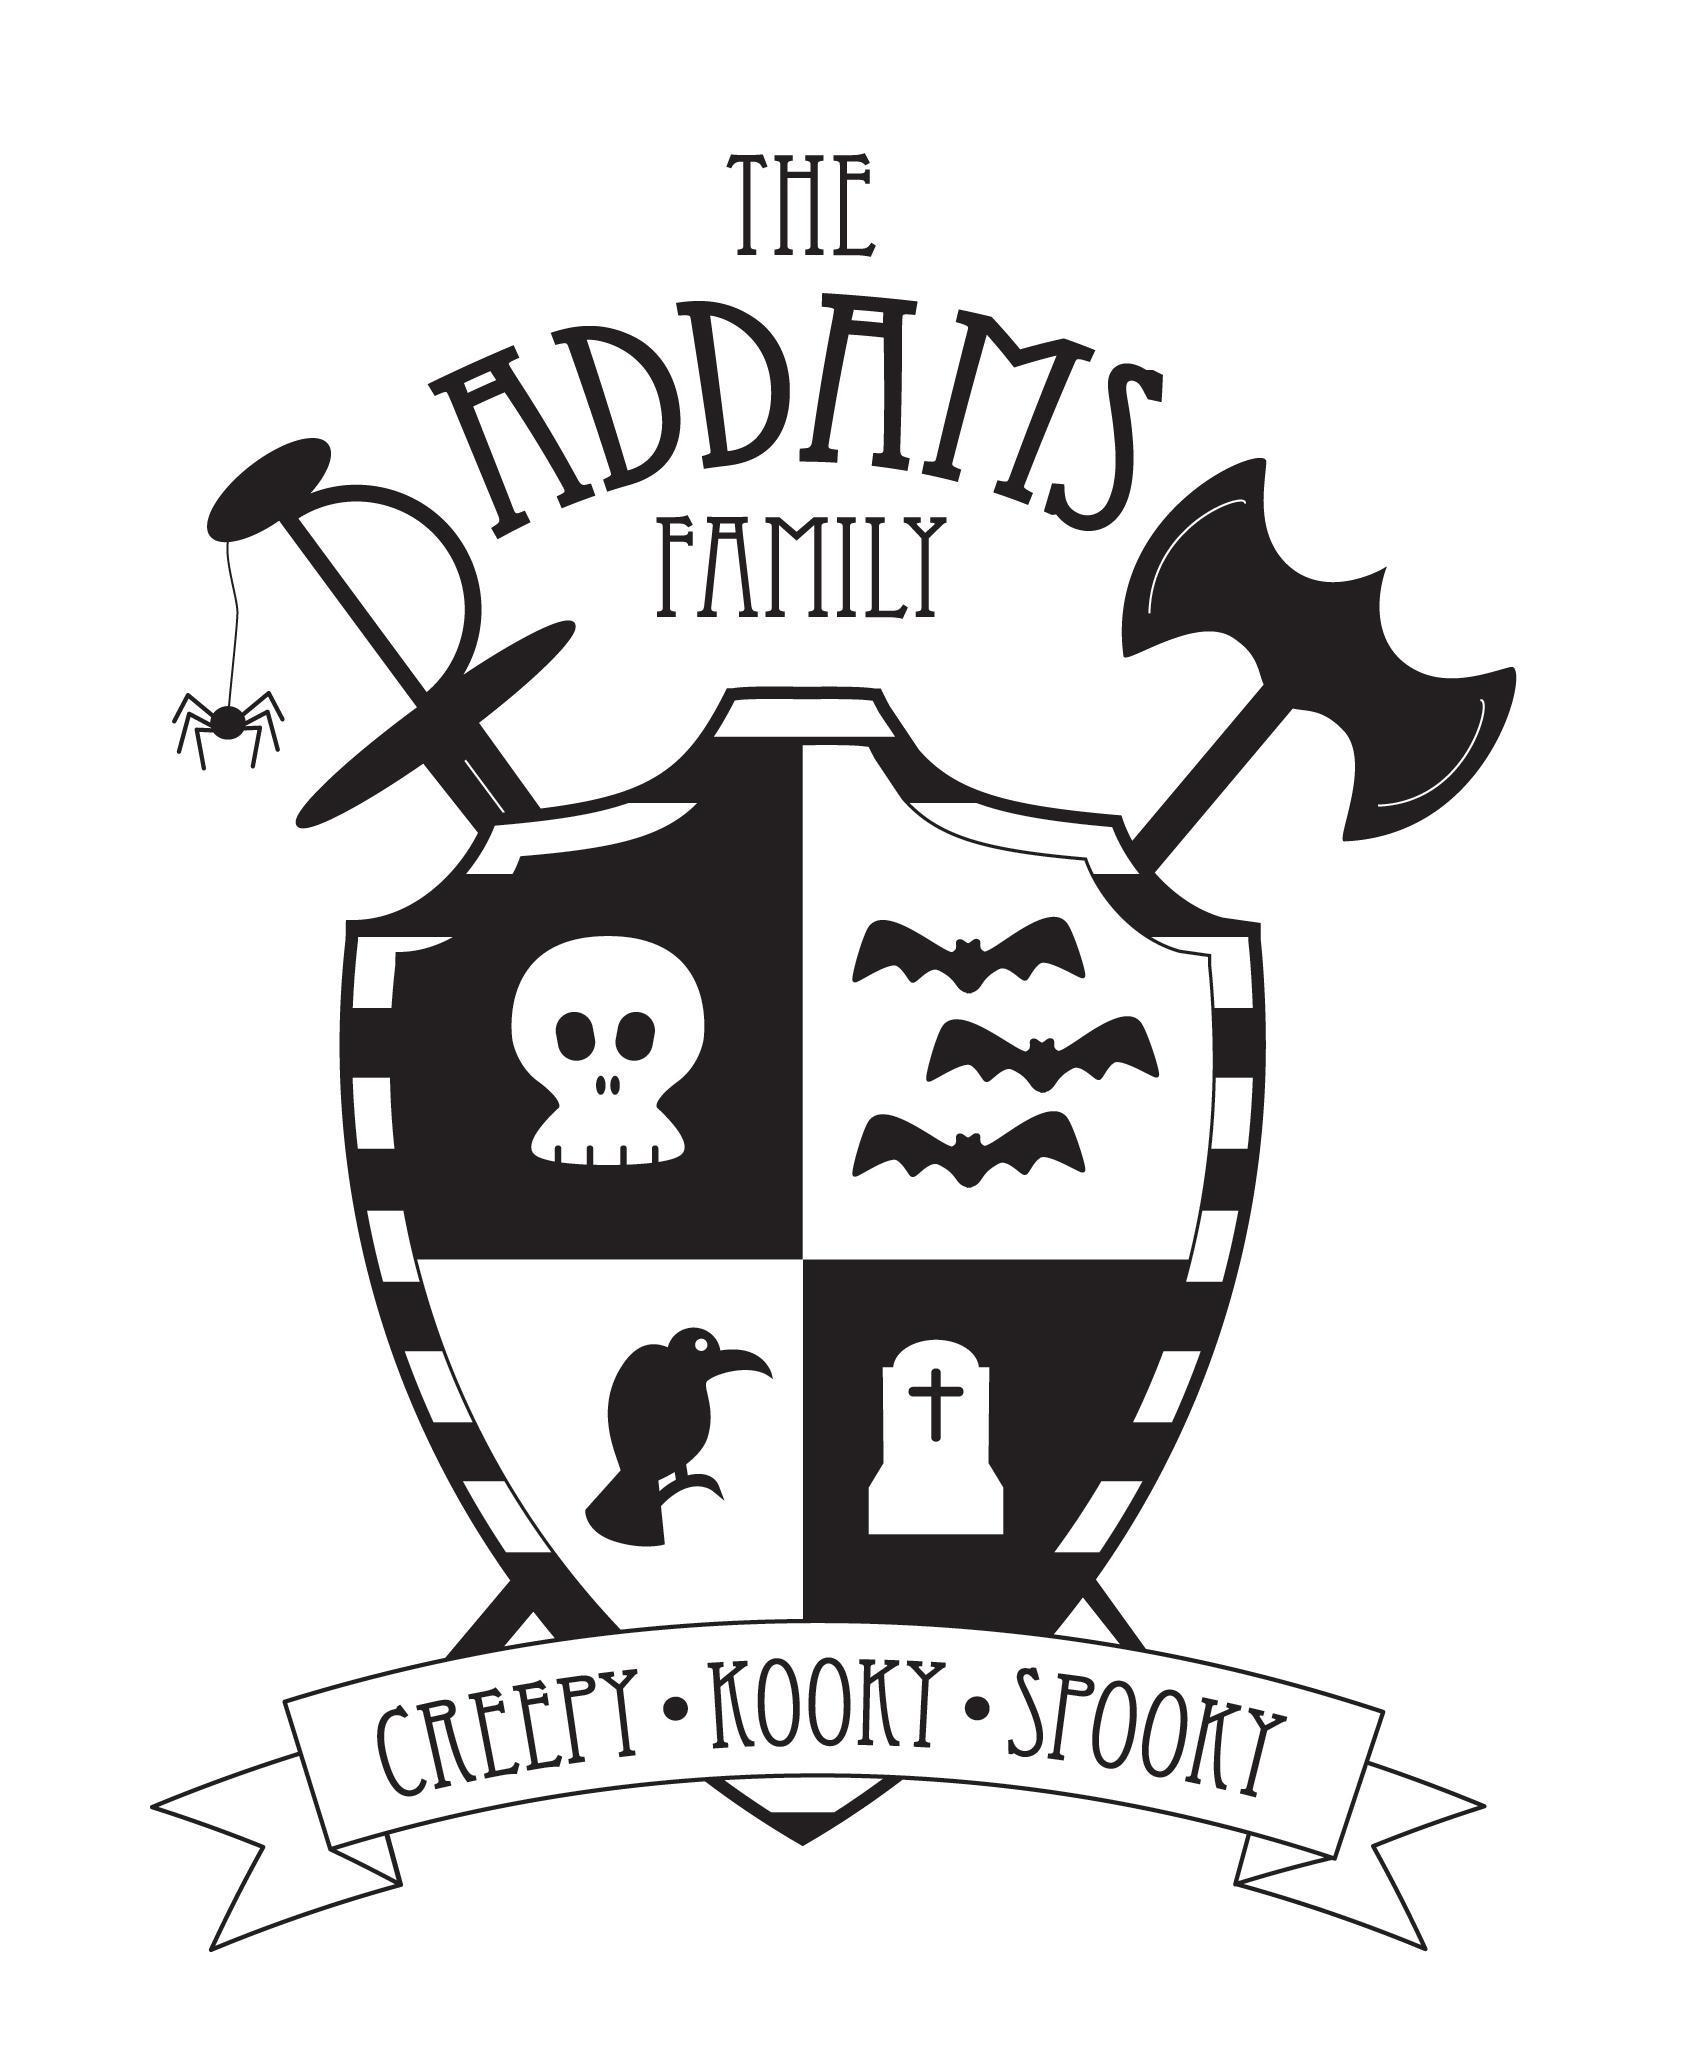 Addams family crest skillshare projects addams family crest buycottarizona